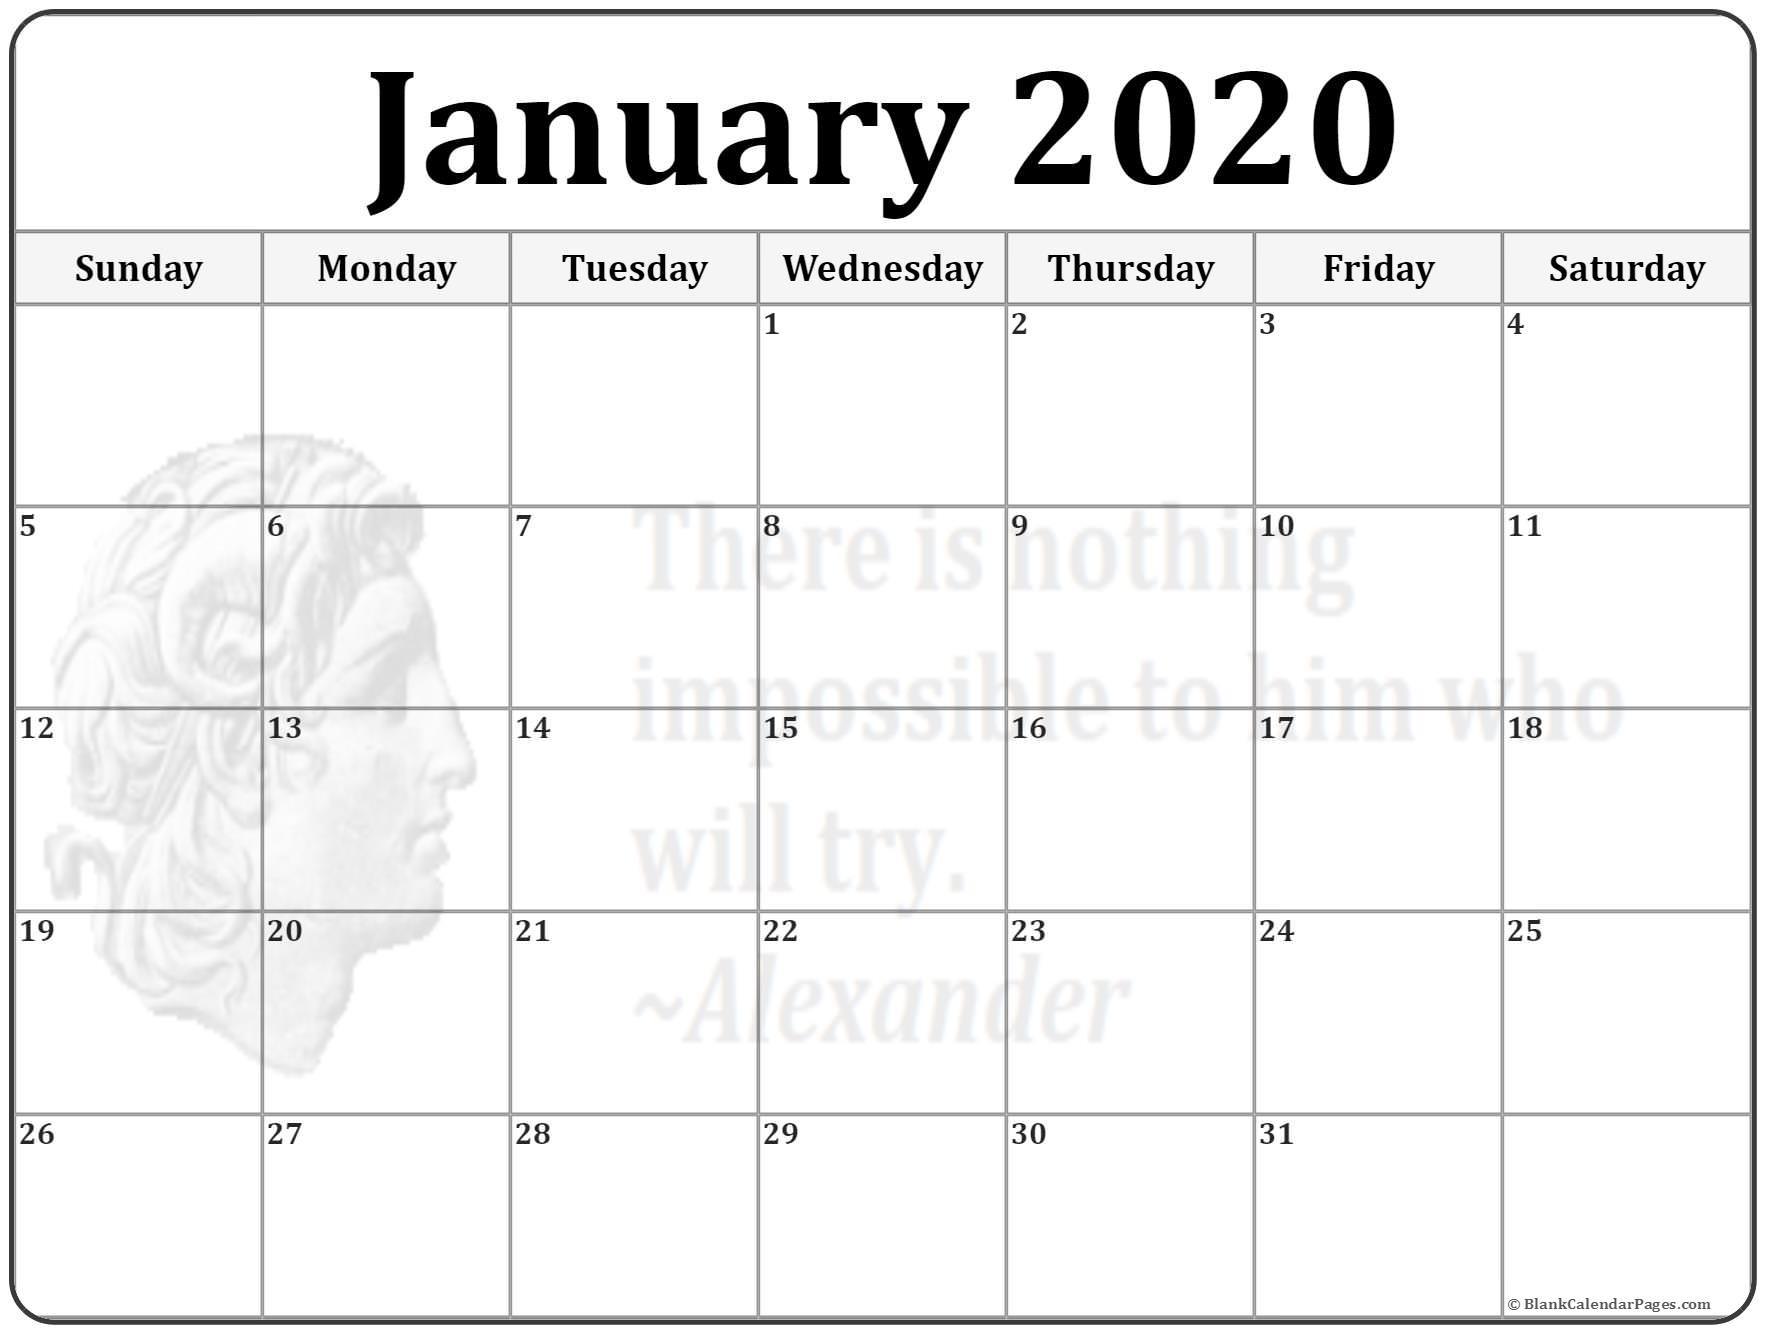 Free Printable January 2020 Calendar January 2020 Calendar